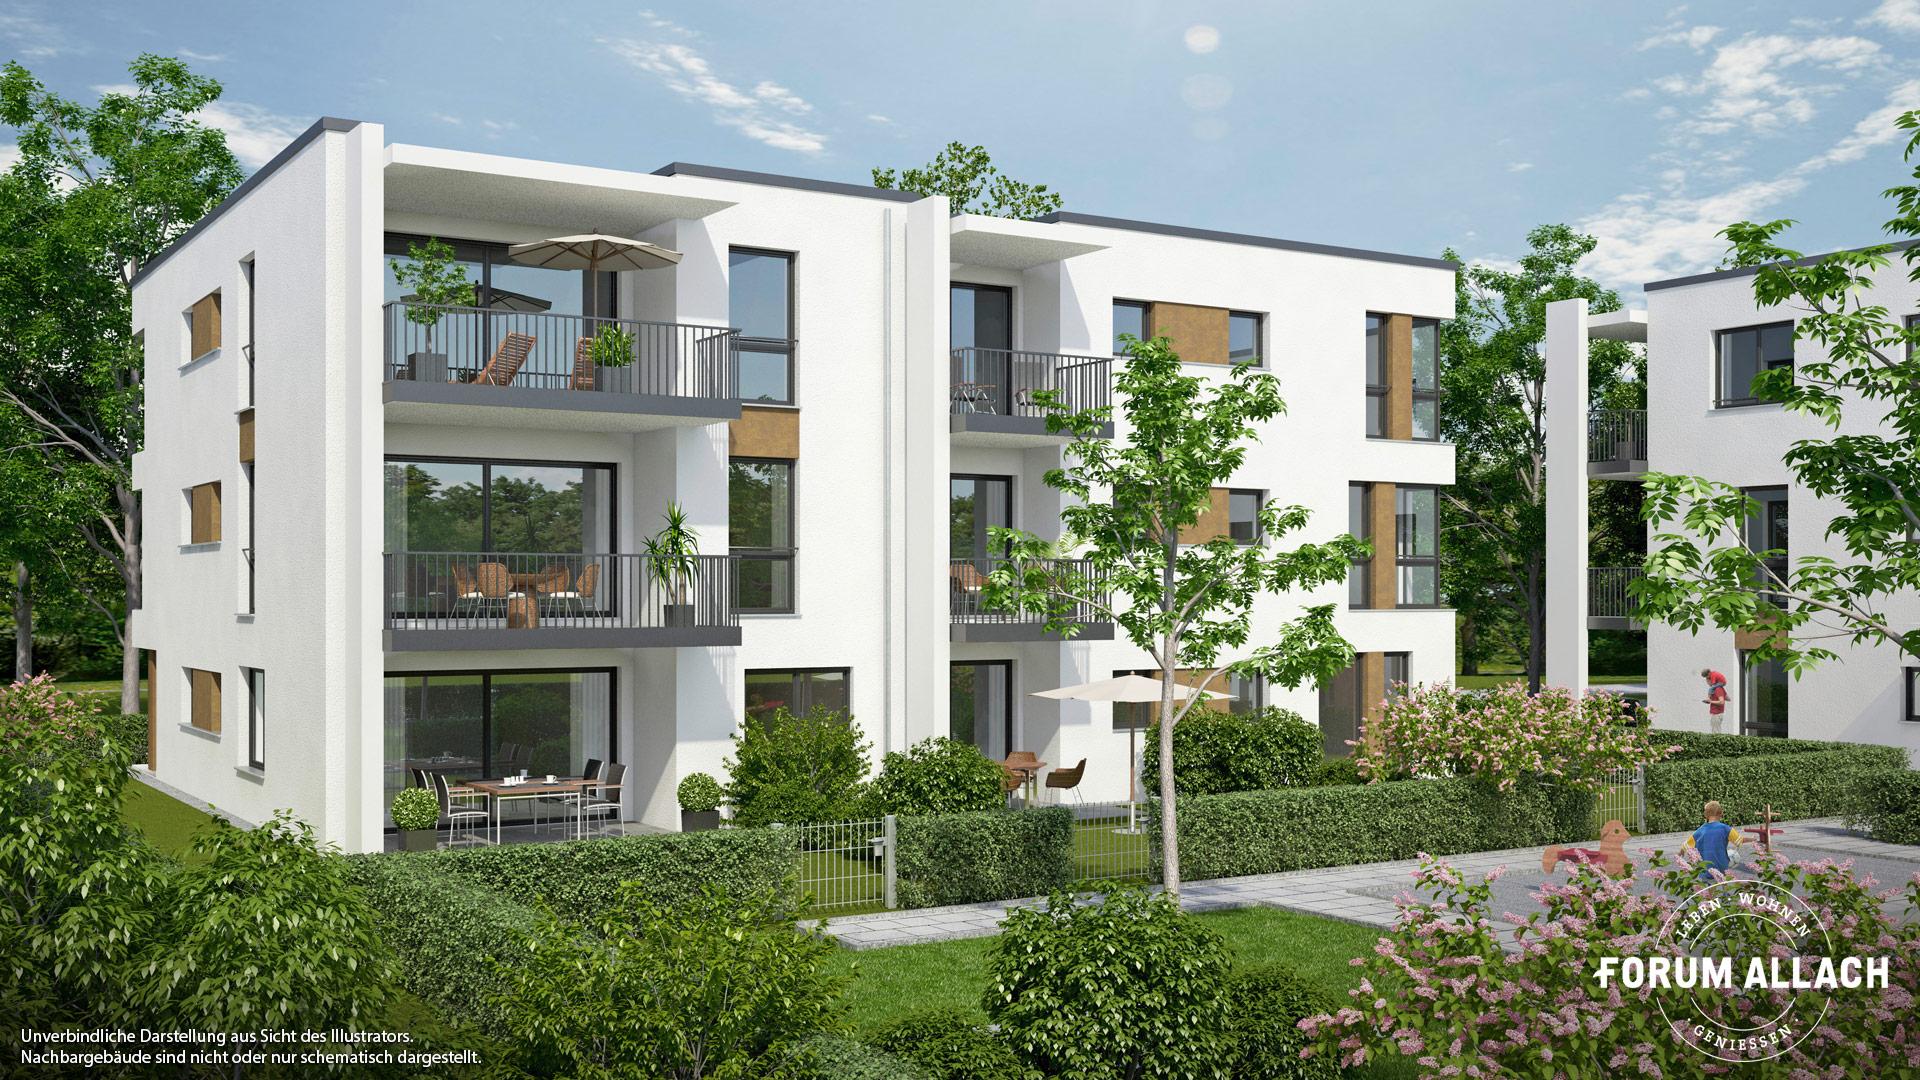 Immobilie Forum Allach - Illustration 1